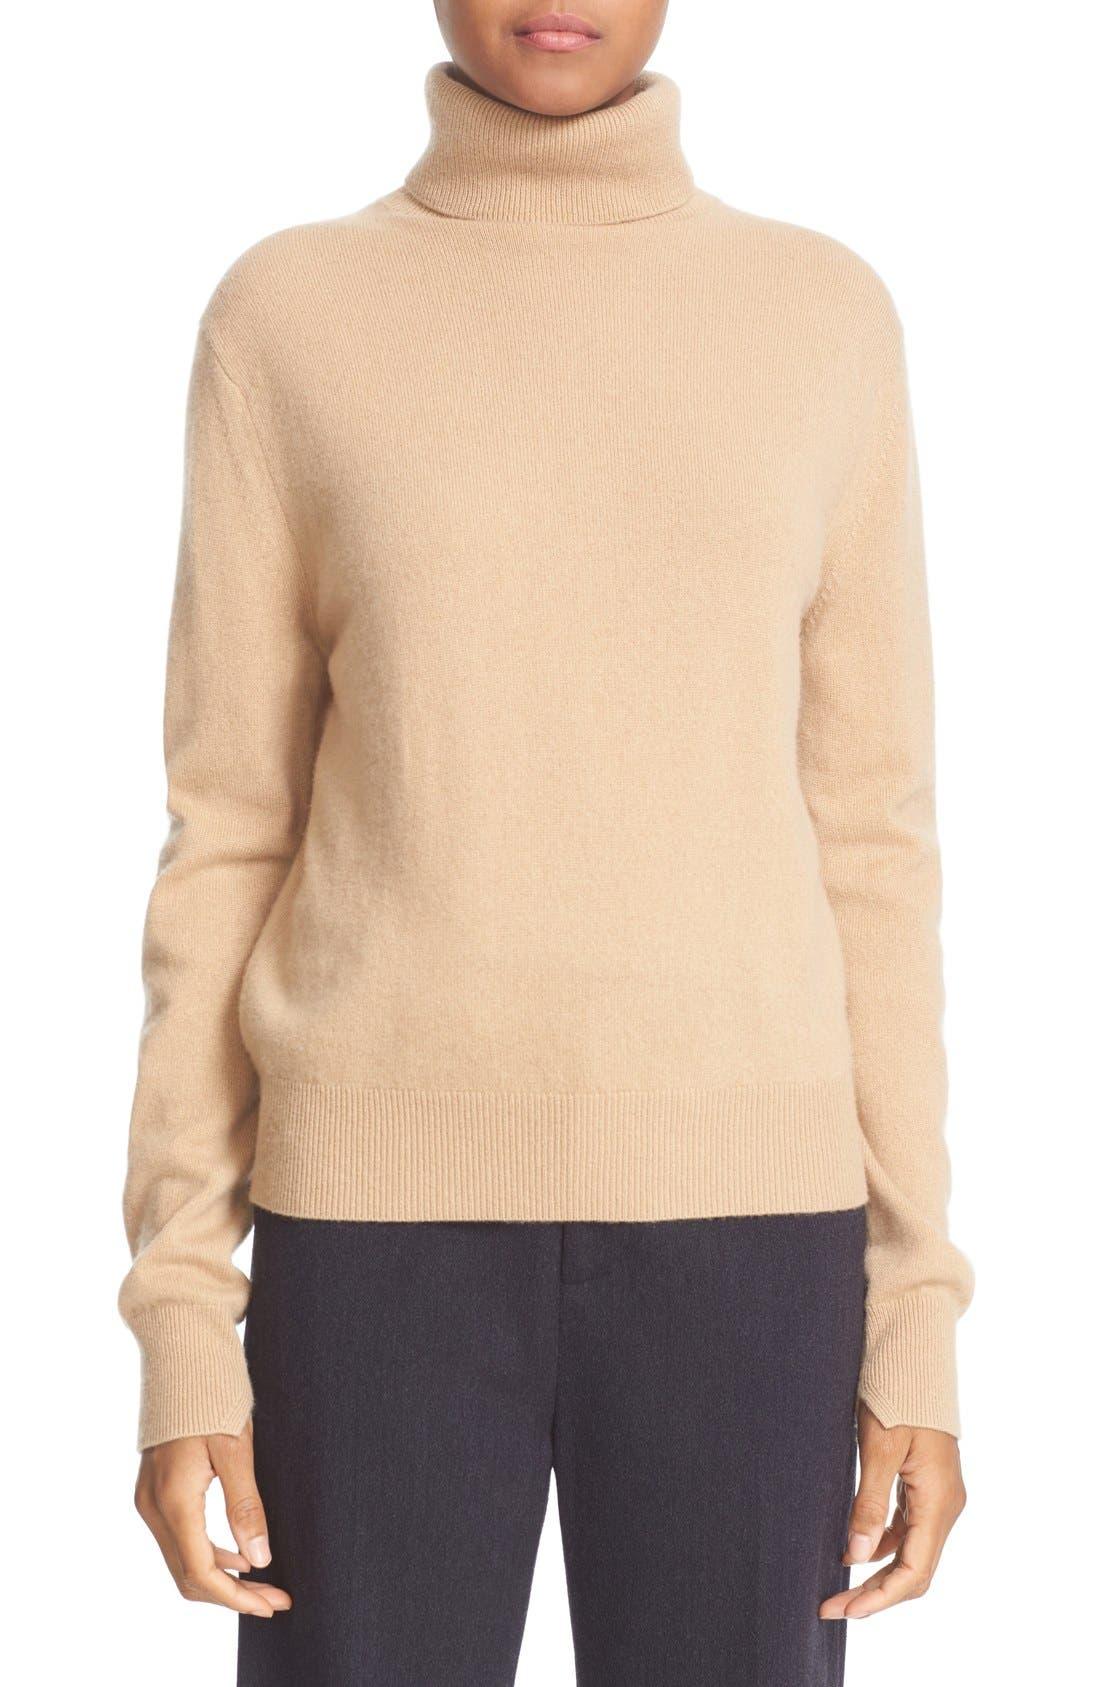 Alternate Image 1 Selected - Vince Cashmere Turtleneck Sweater